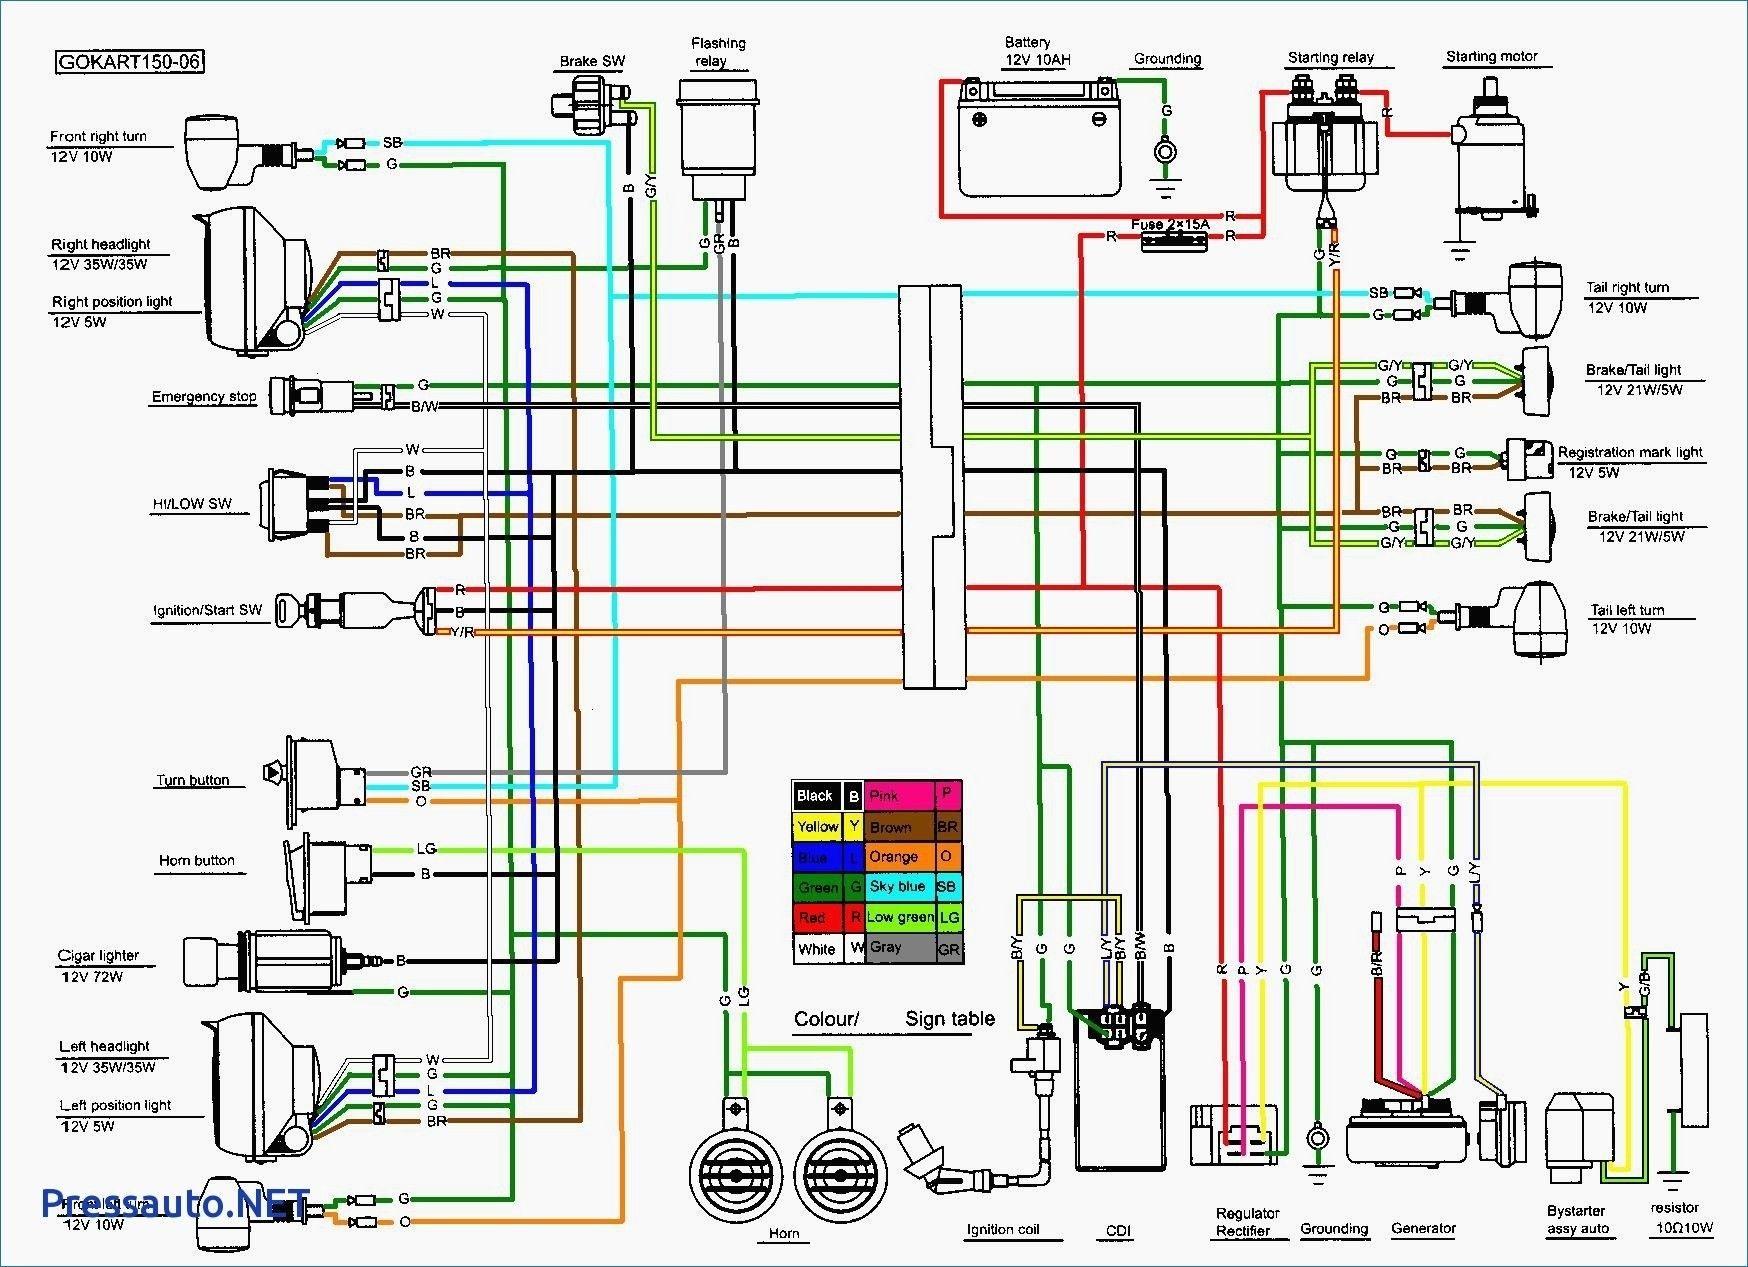 medium resolution of unique wiring diagram for electric razor scooter diagram razor scooter battery wiring diagram razor scooter diagram